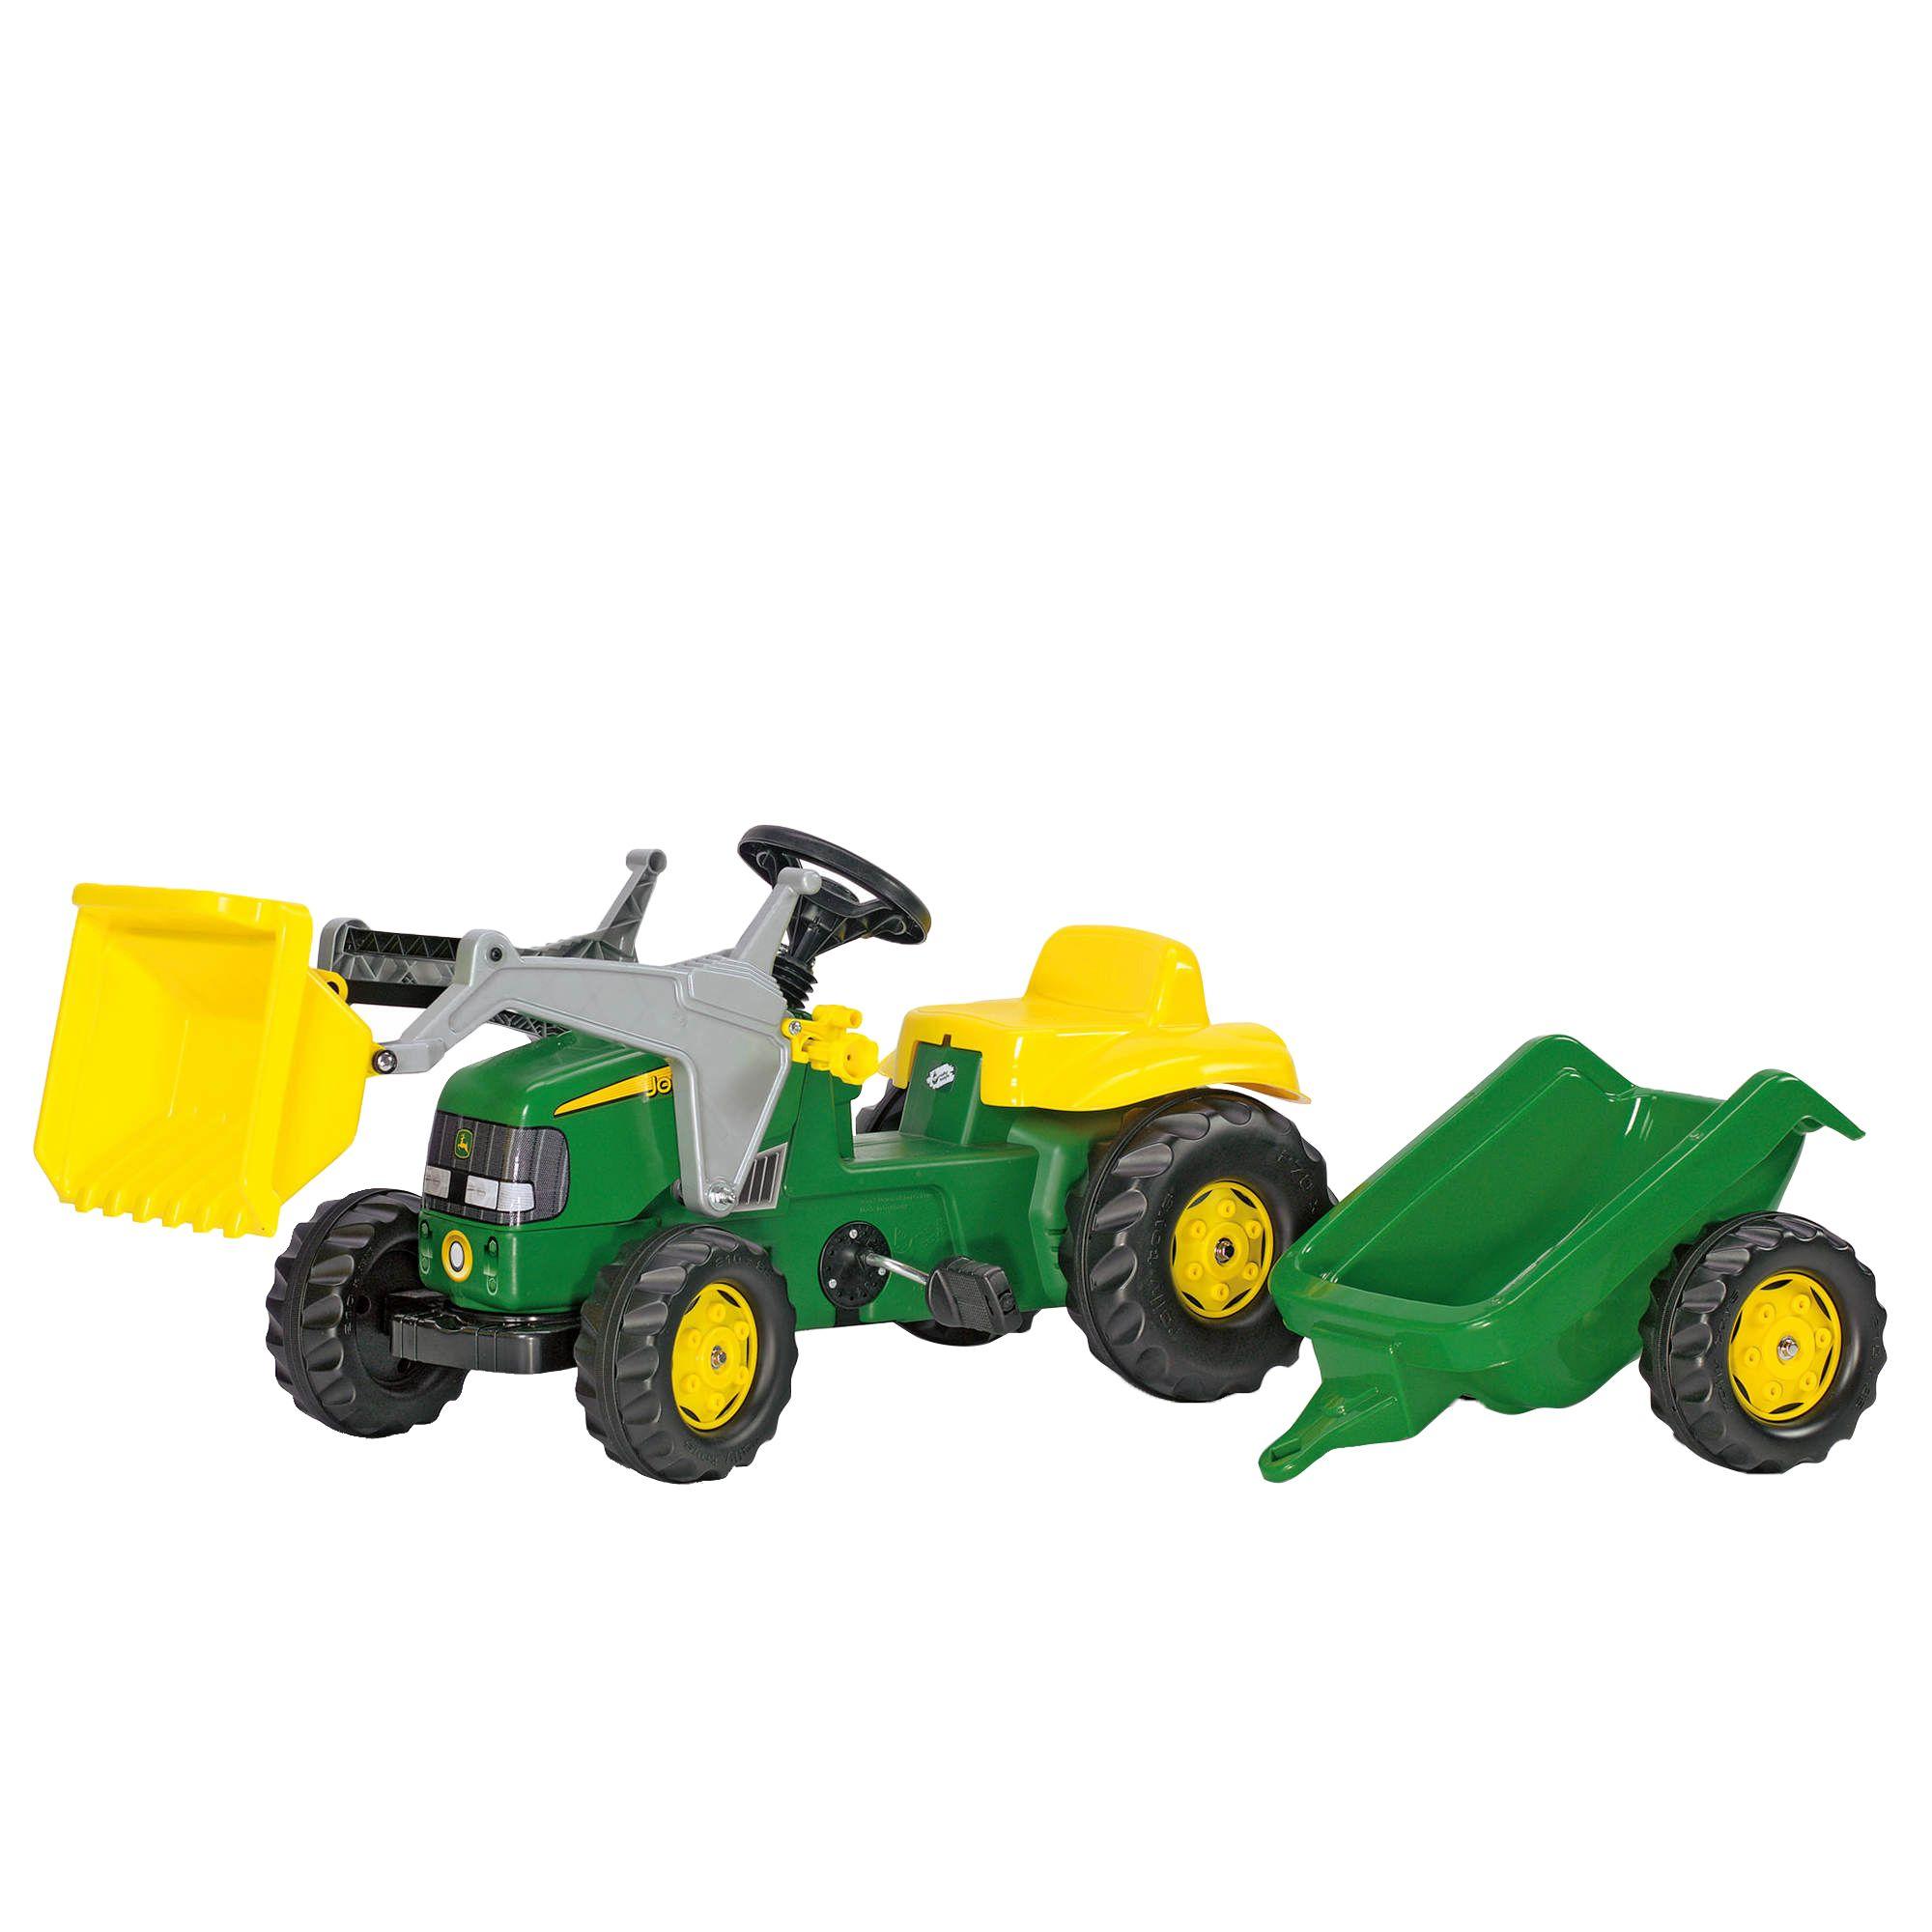 John Deere Kid Tractor With Loader And Trailer Bjs